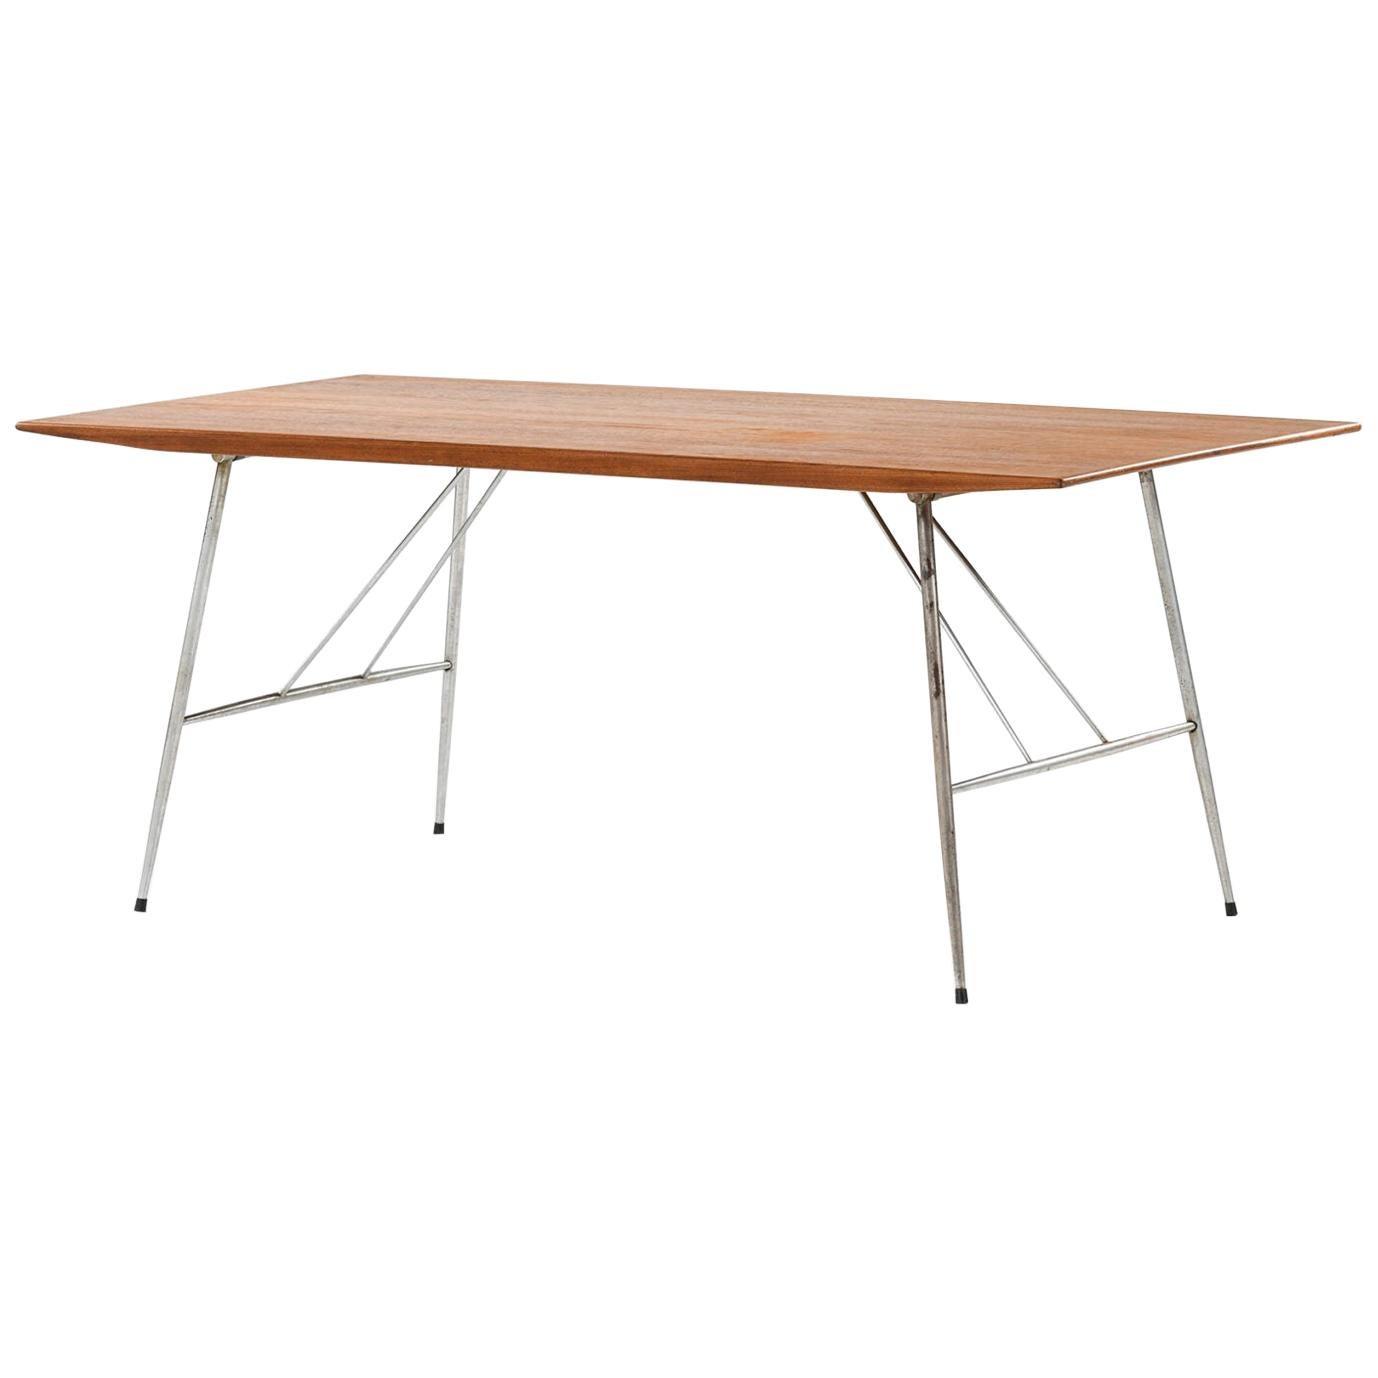 Børge Mogensen Dining Table / Desk Produced by Søborg Møbler in Denmark